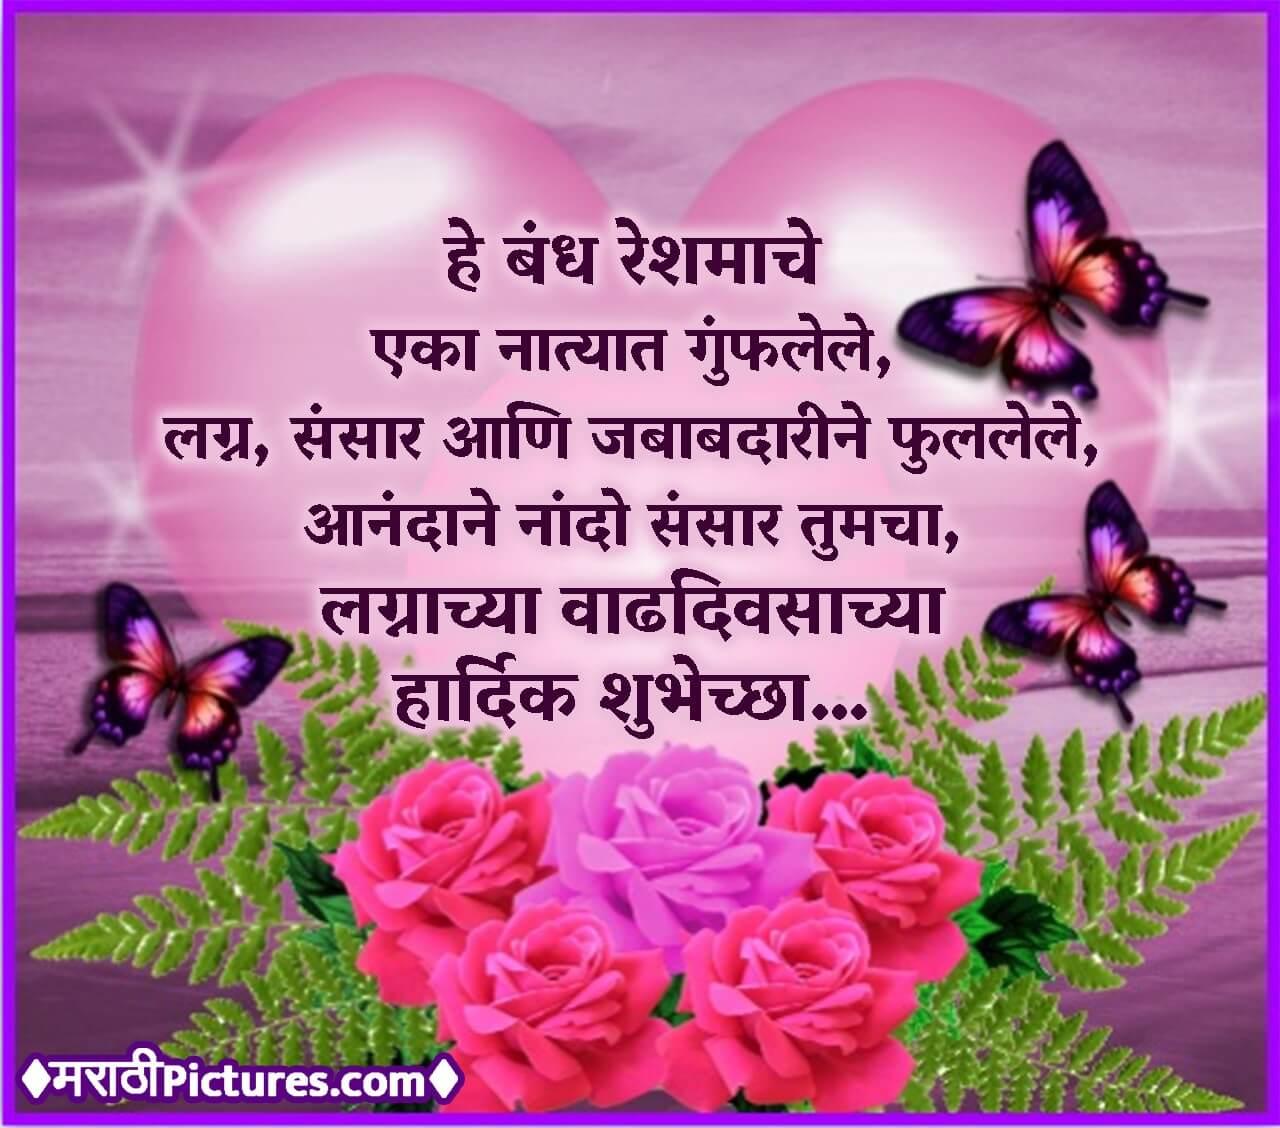 He Bandh Reshmache Eka Natyat Gunflele